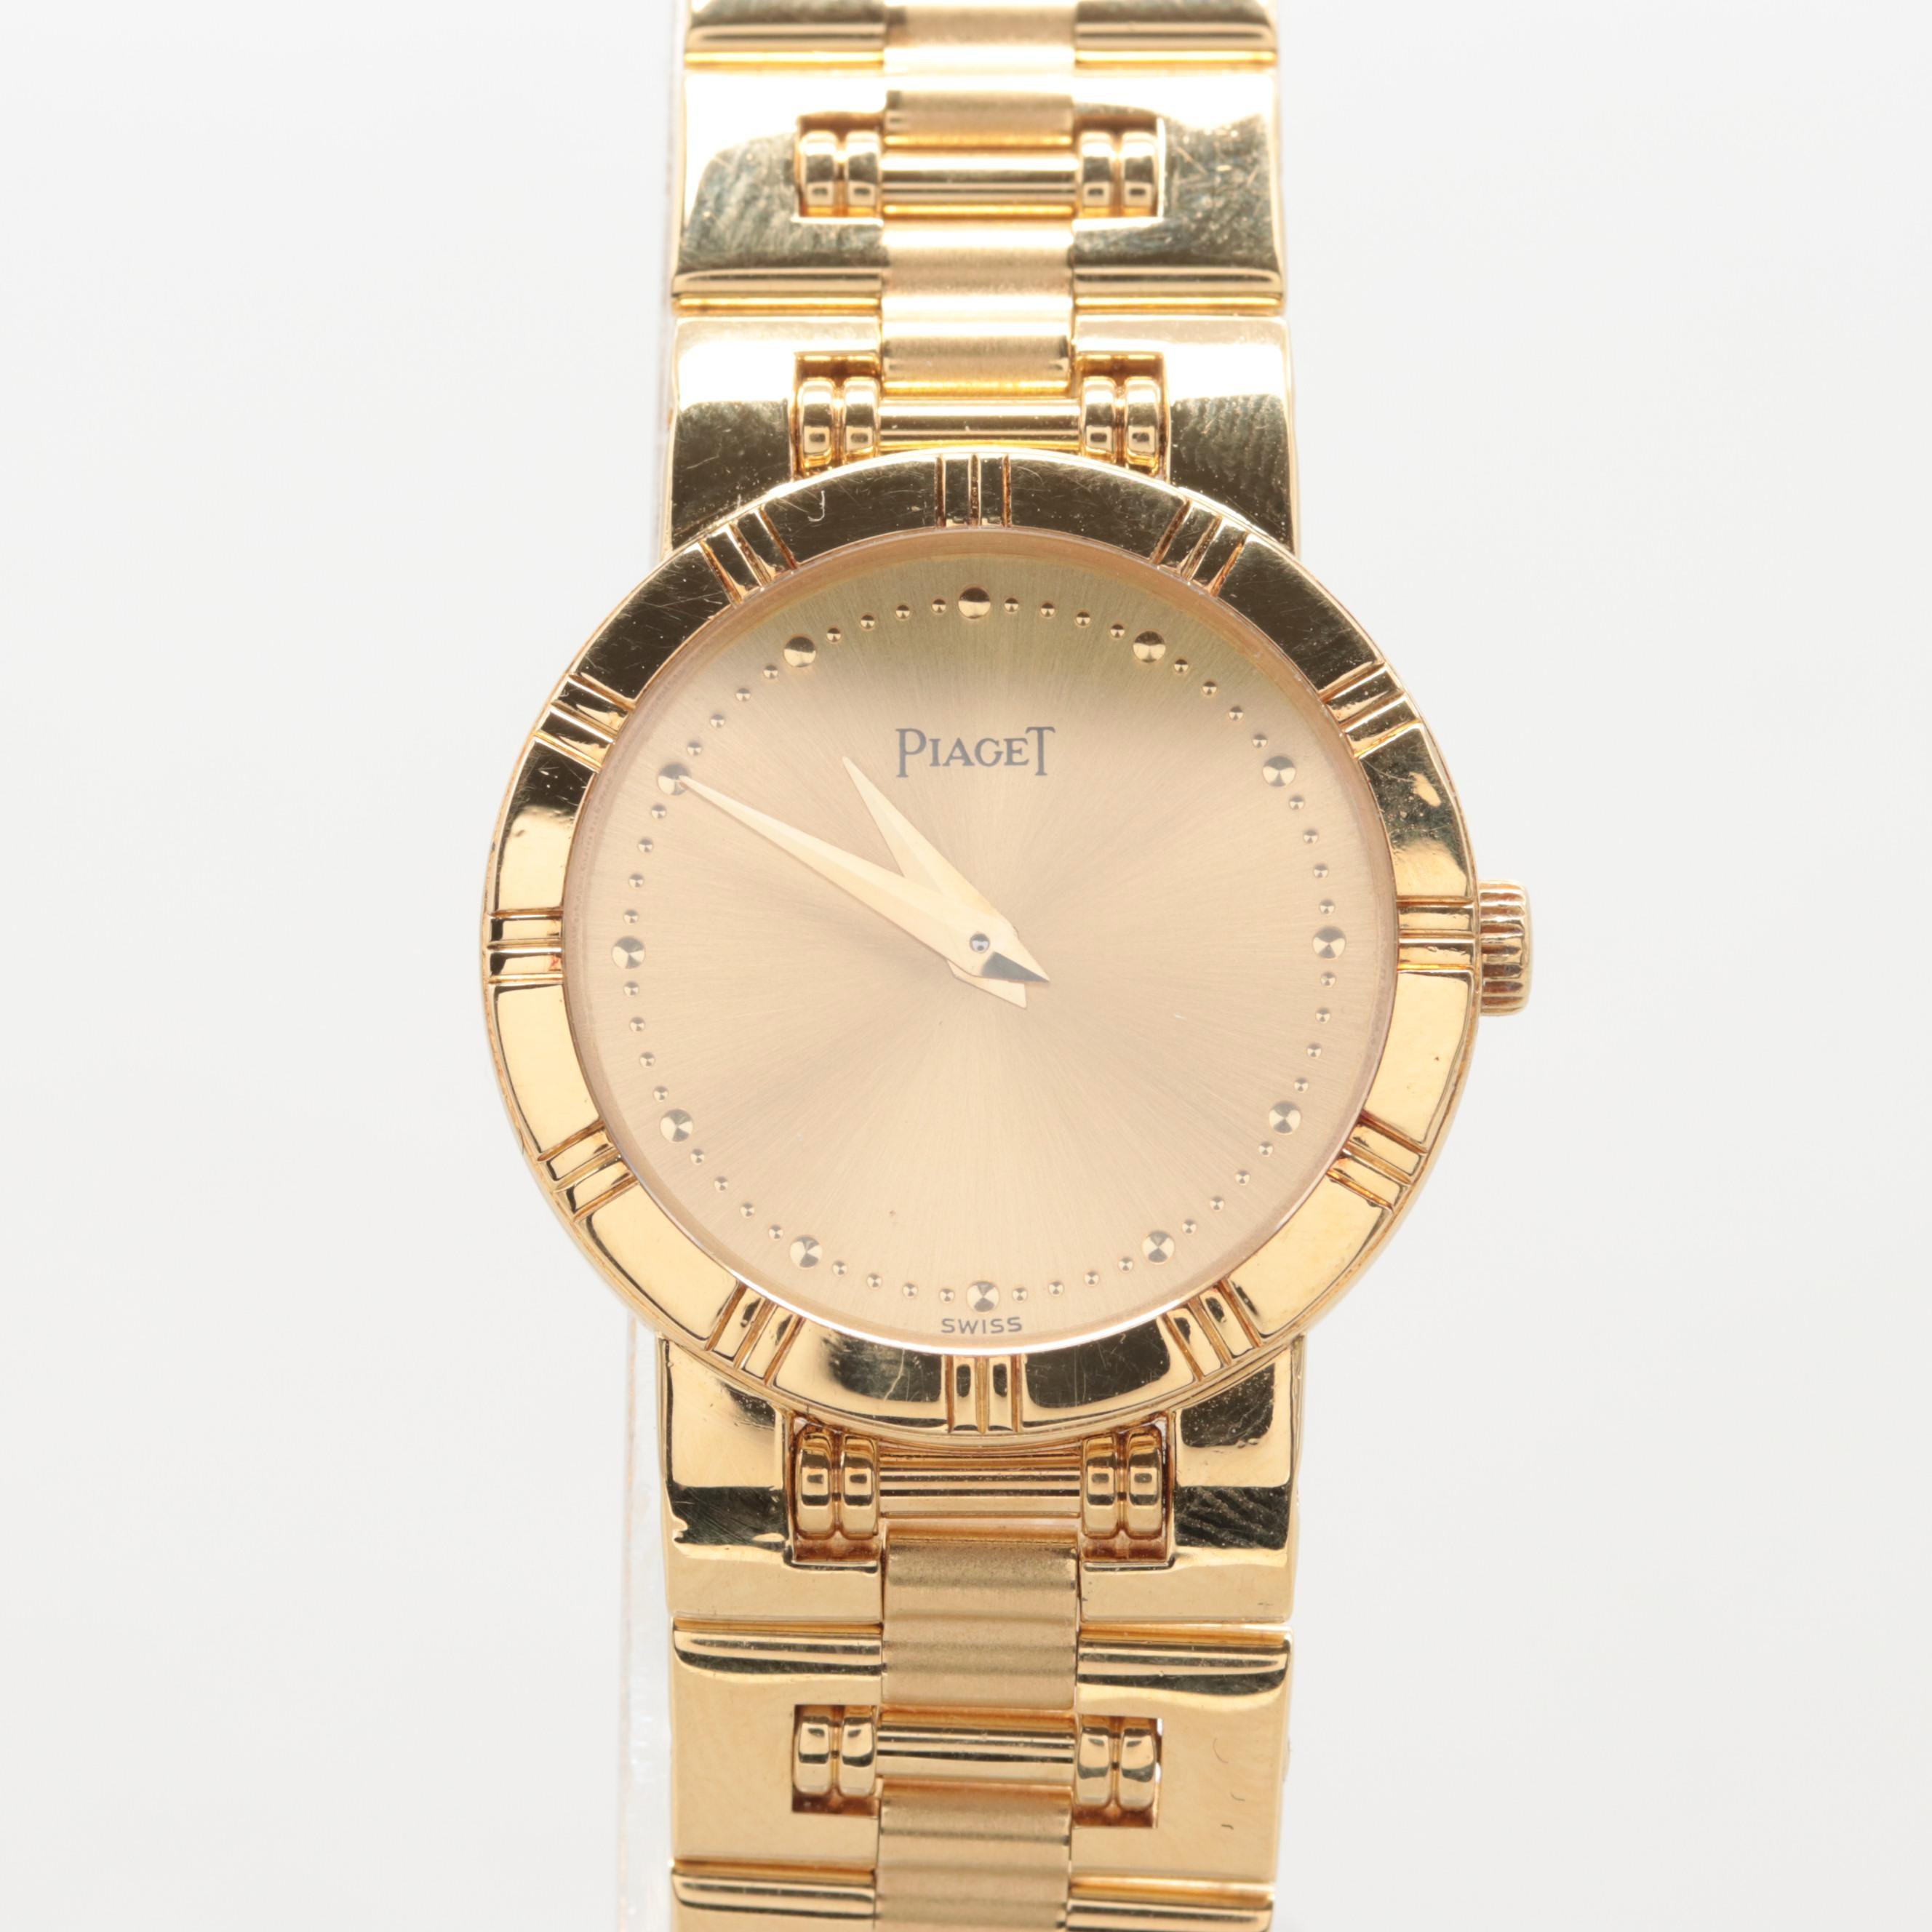 Piaget Dancer 18K Solid Yellow Gold Quartz Wristwatch